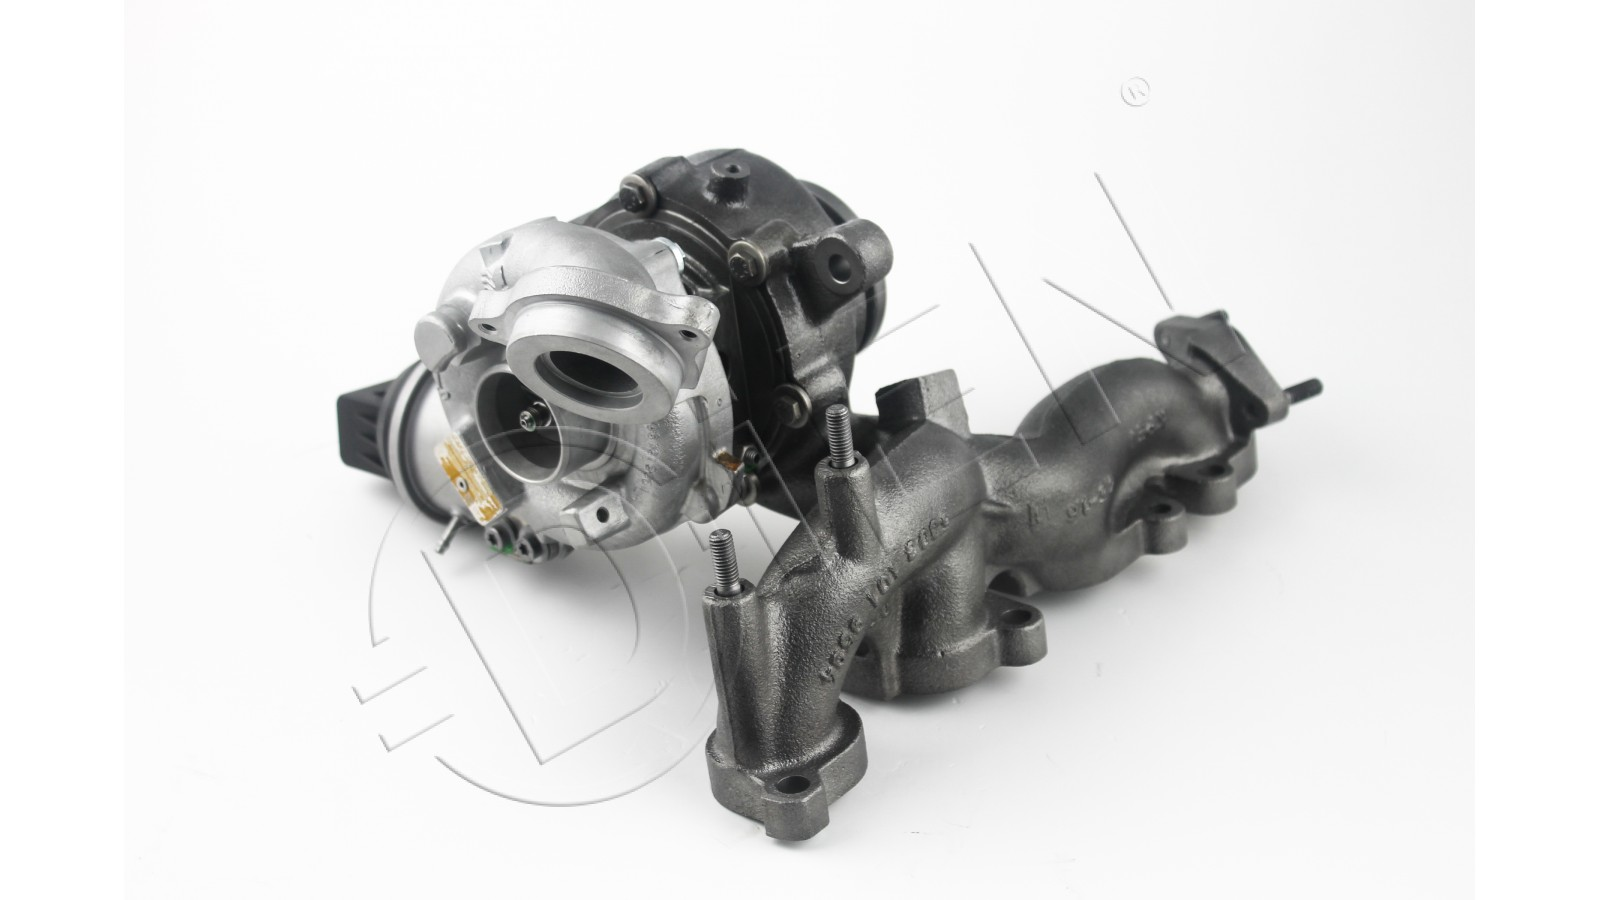 Turbocompressore  VOLKSWAGEN  SCIROCCO  2.0 TDI  170Cv  1968ccm  mag 2009